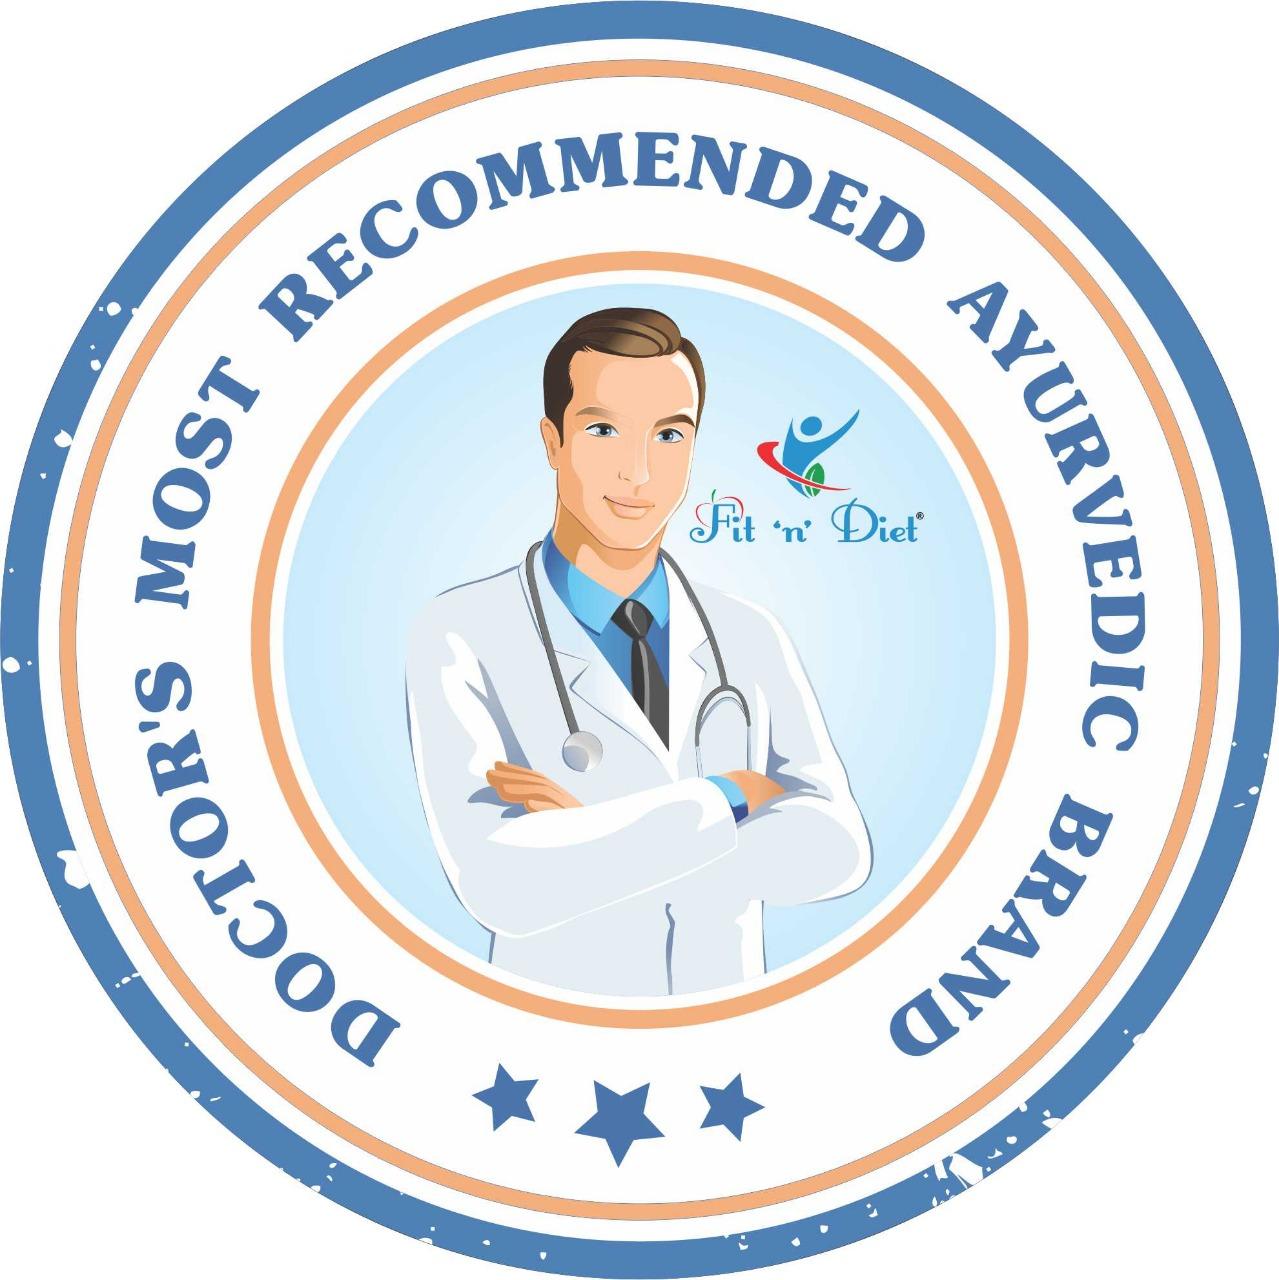 FITNDIET INTERNATIONAL, LUDHIANA, health and ayurvedic medicine Manufacturer